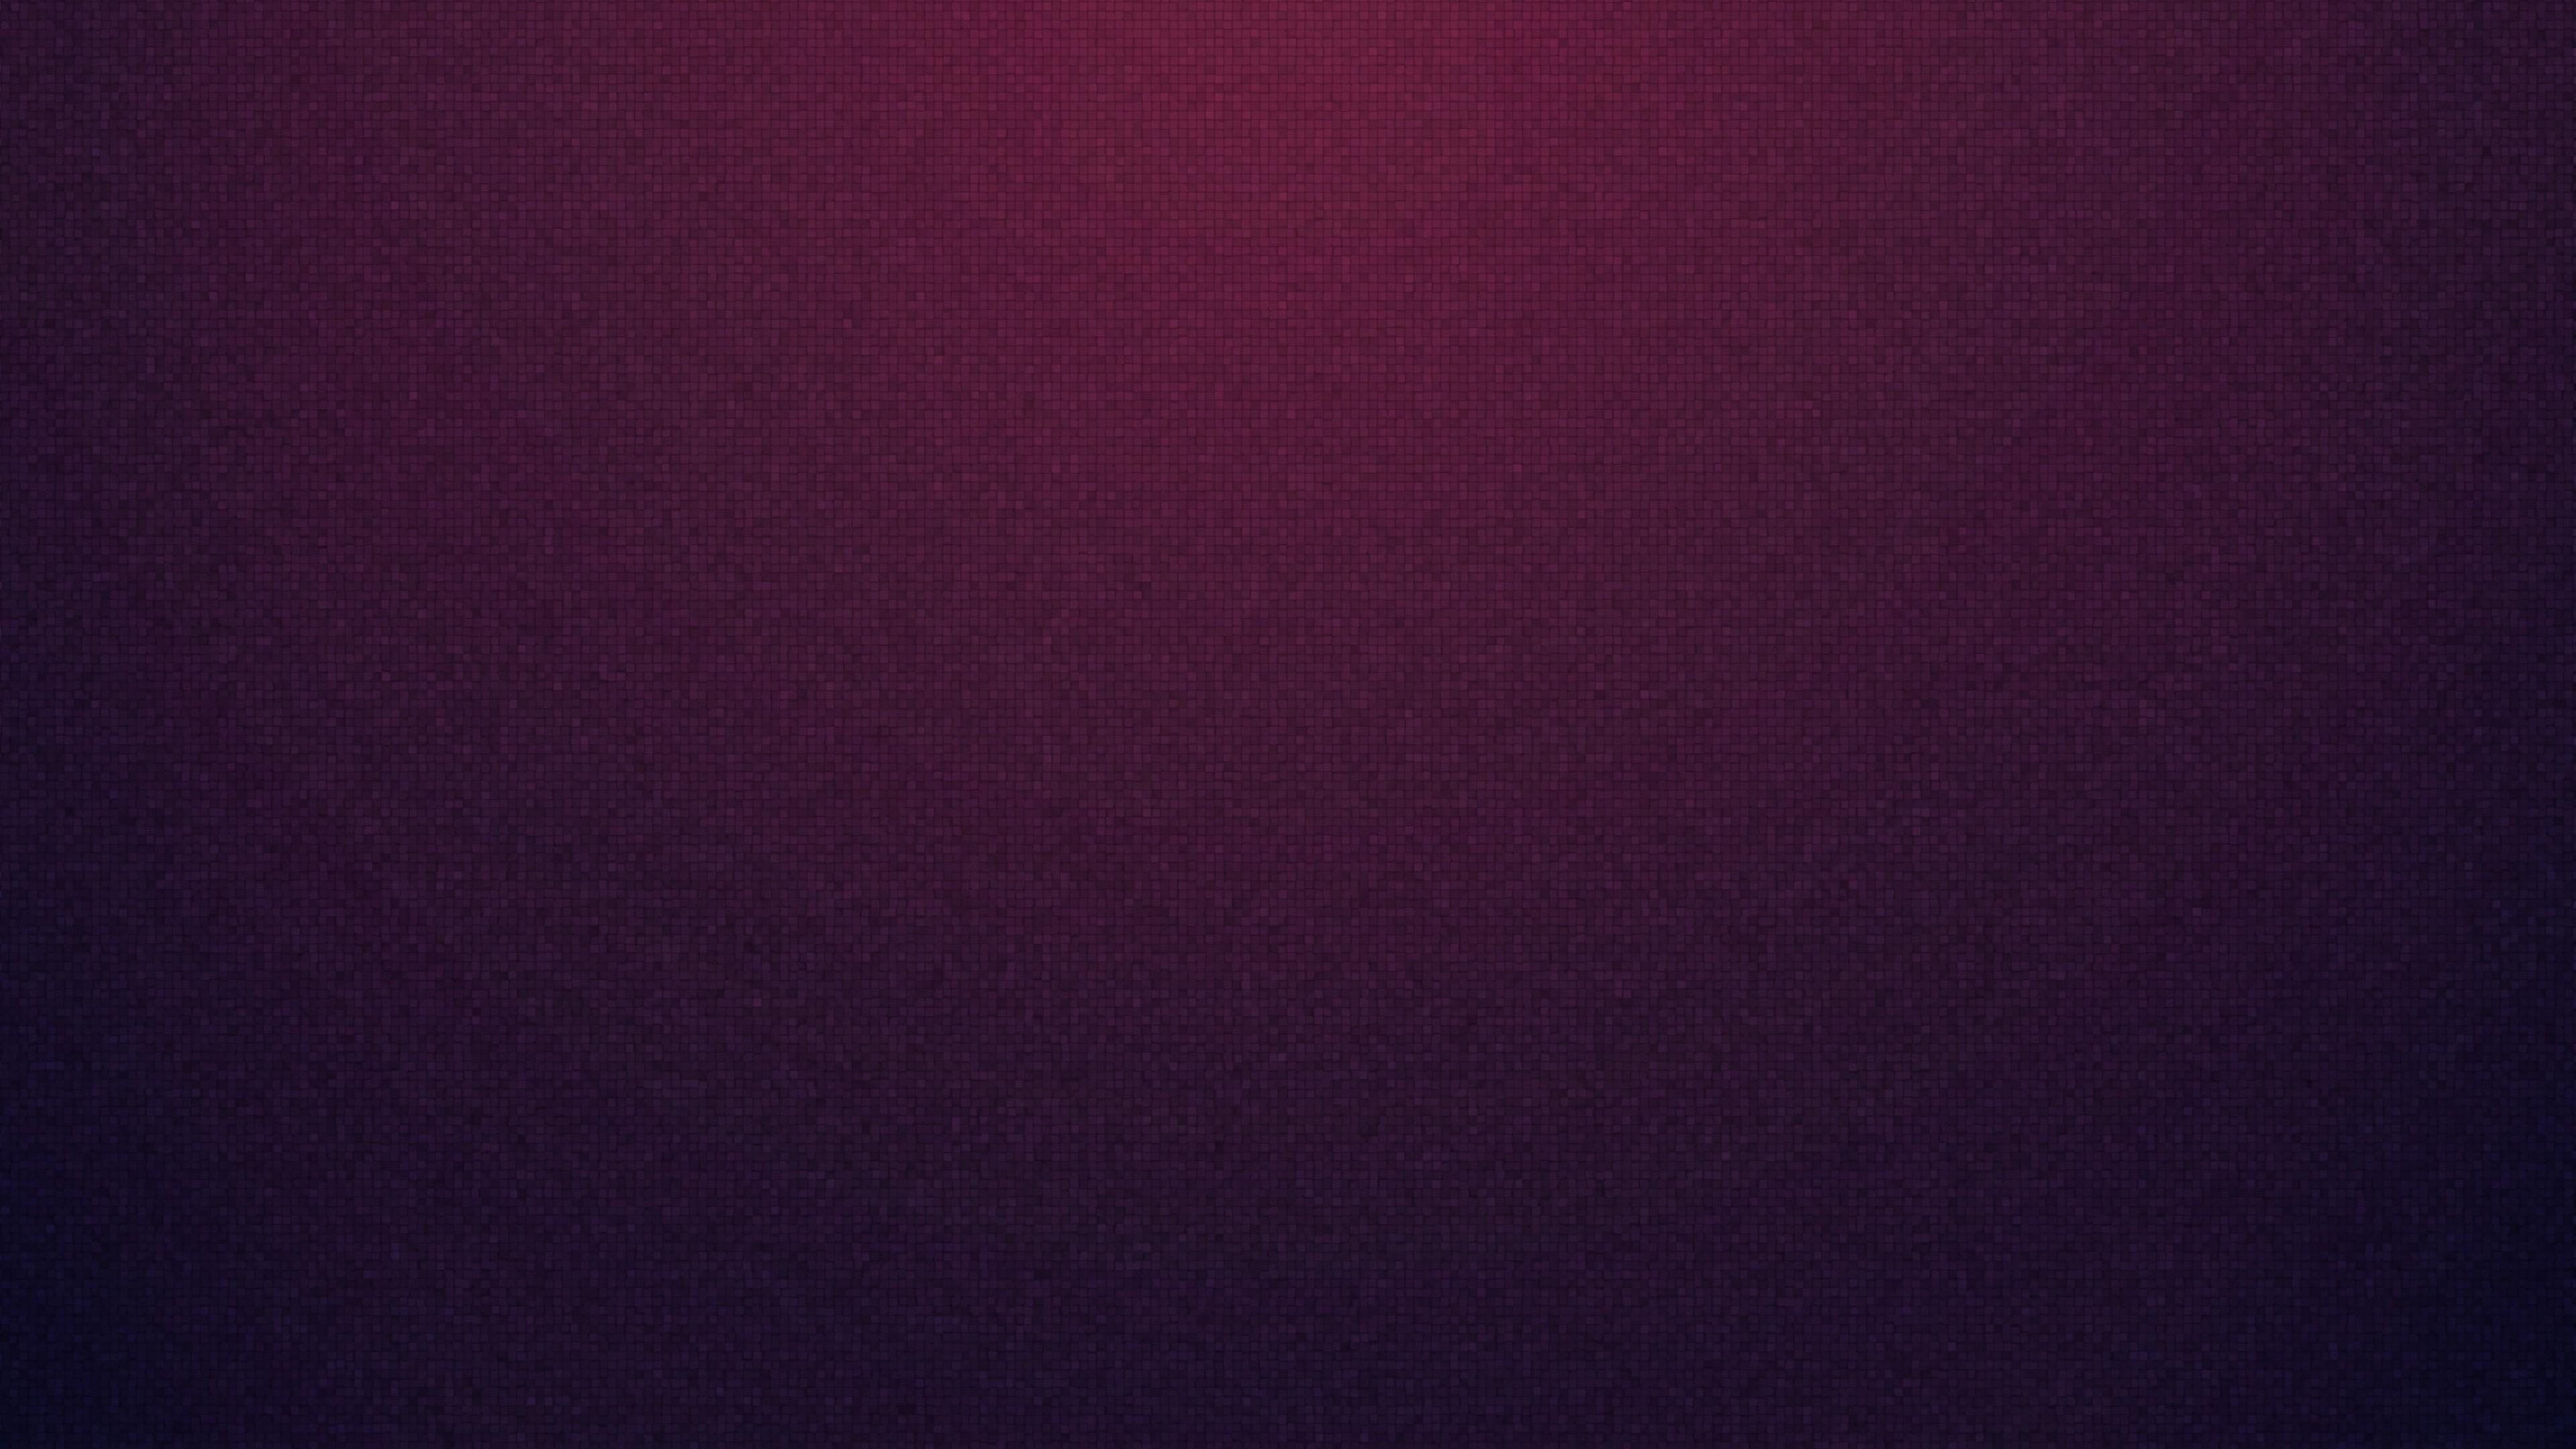 Wallpaper pixels, shadow, color, background